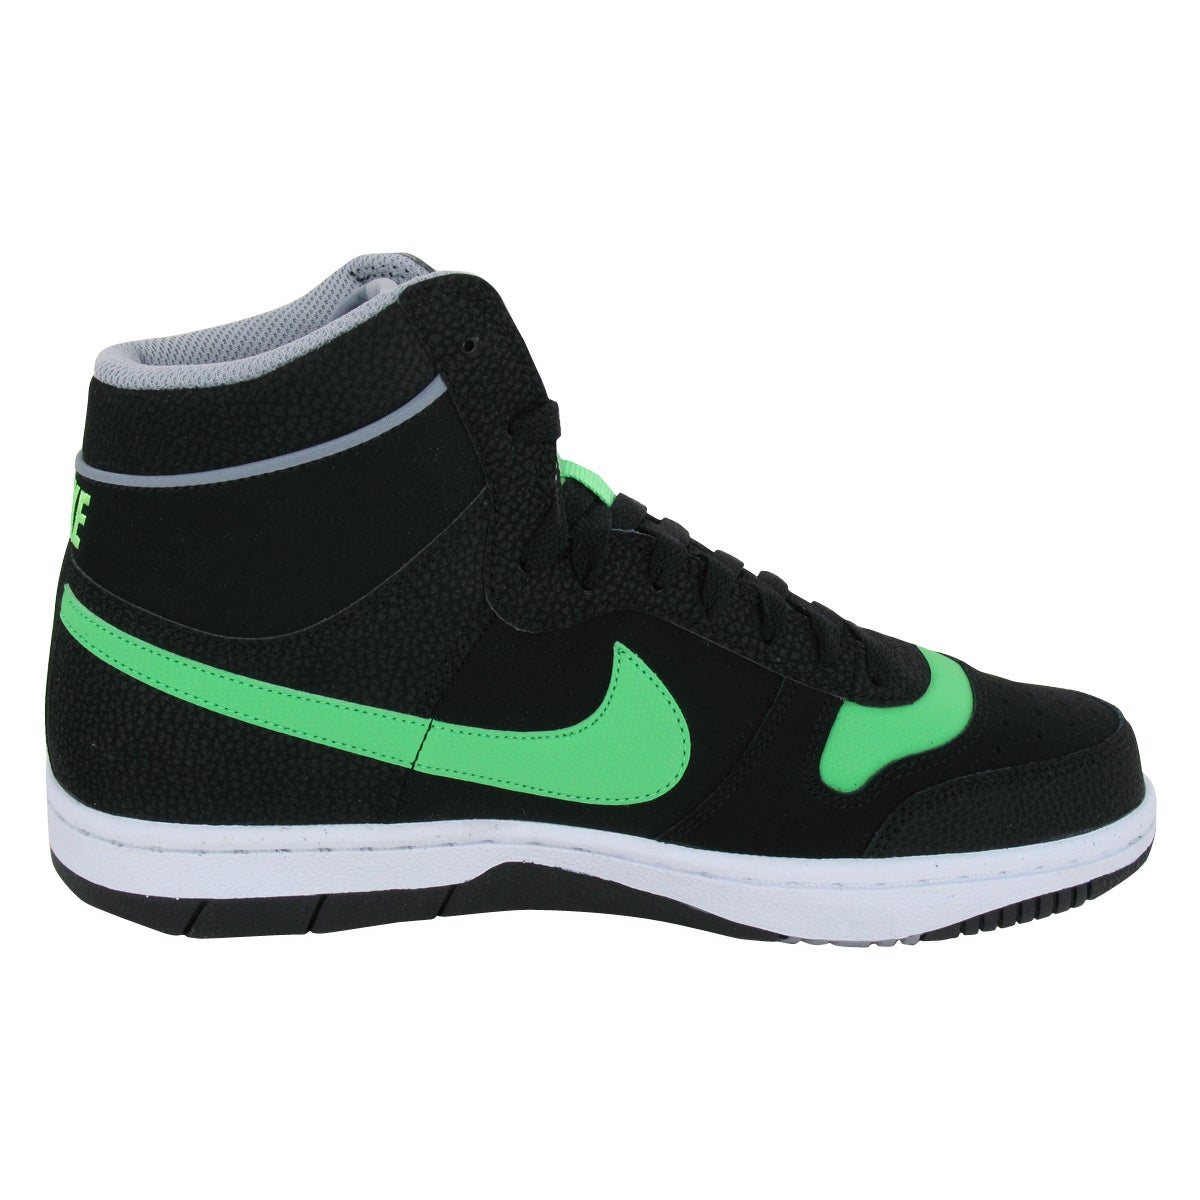 a4d221fd40b50 Nike Sky Team '87 Mid Blackreen/Stdm /White Basketball Shoes